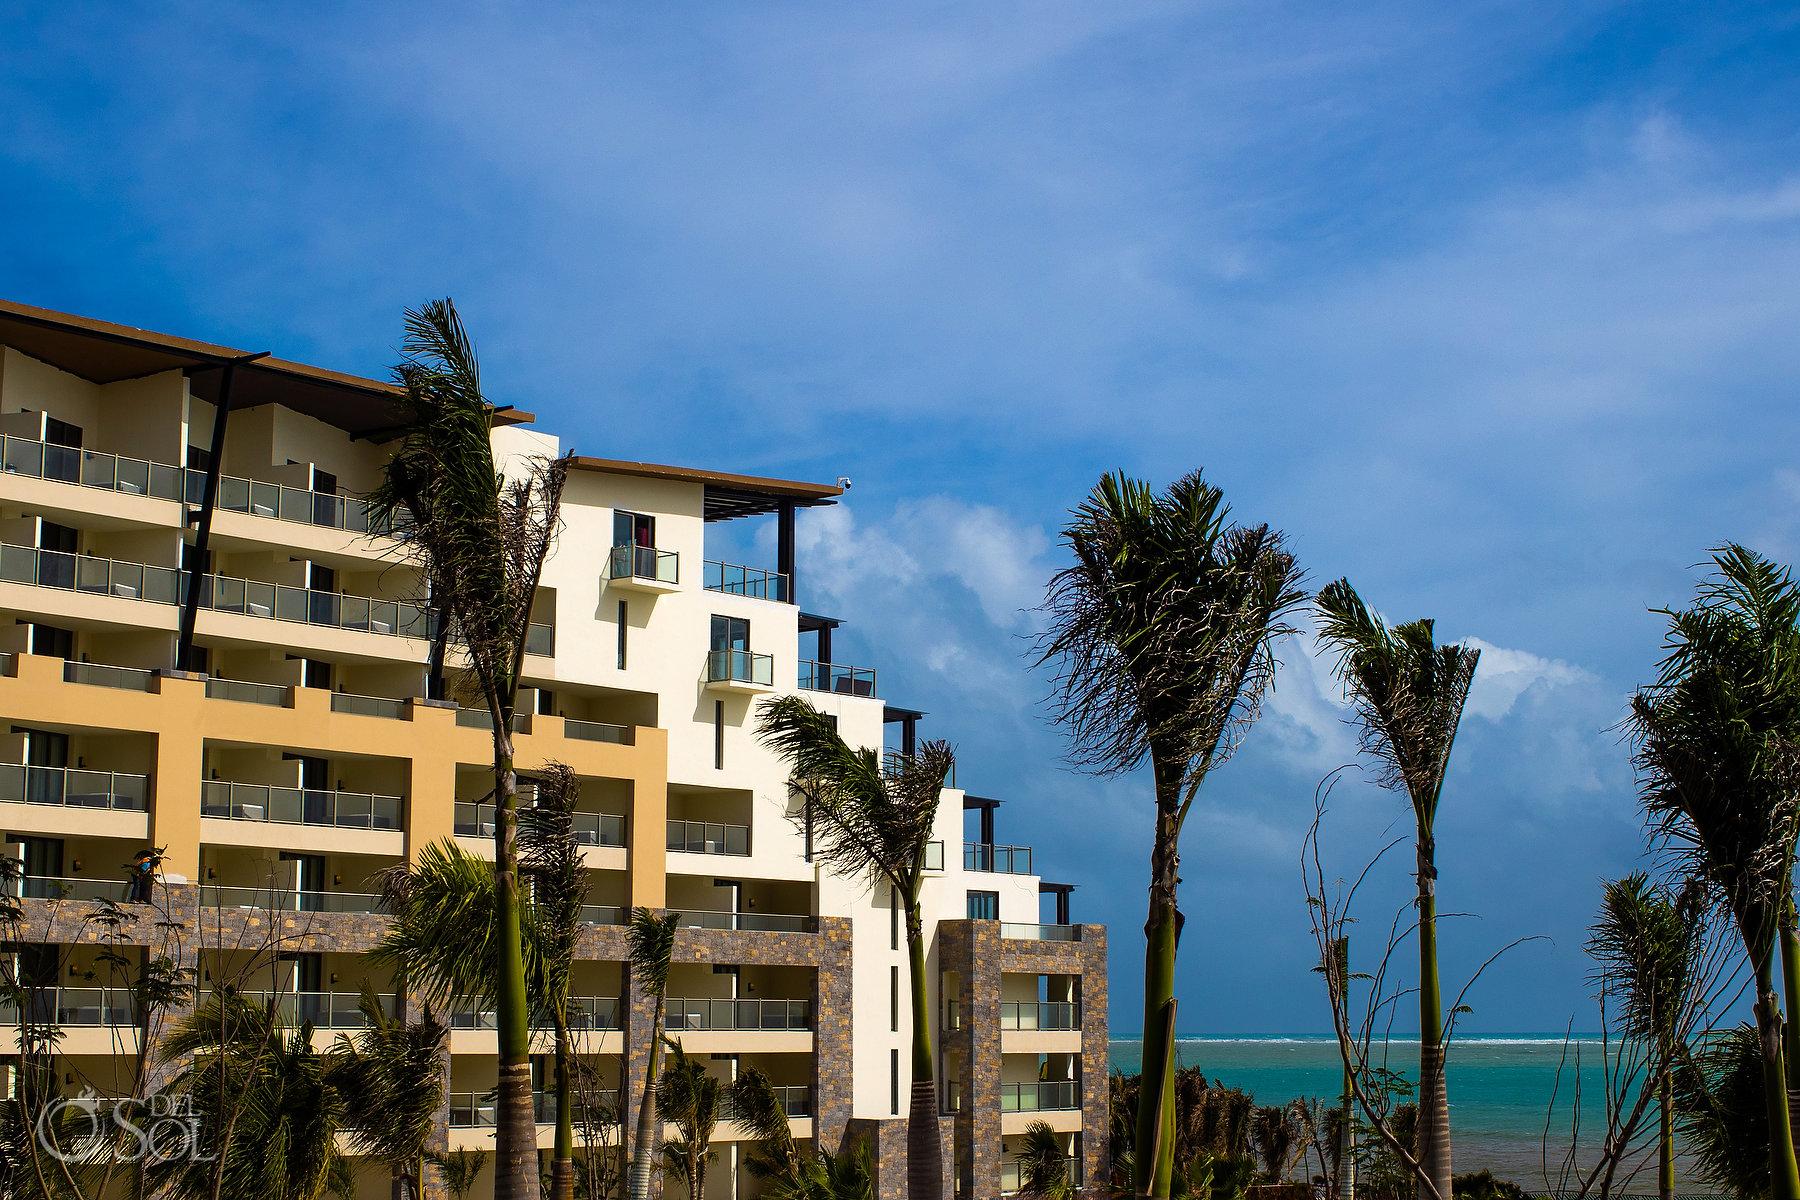 Now Natura Weddings Riviera Cancun